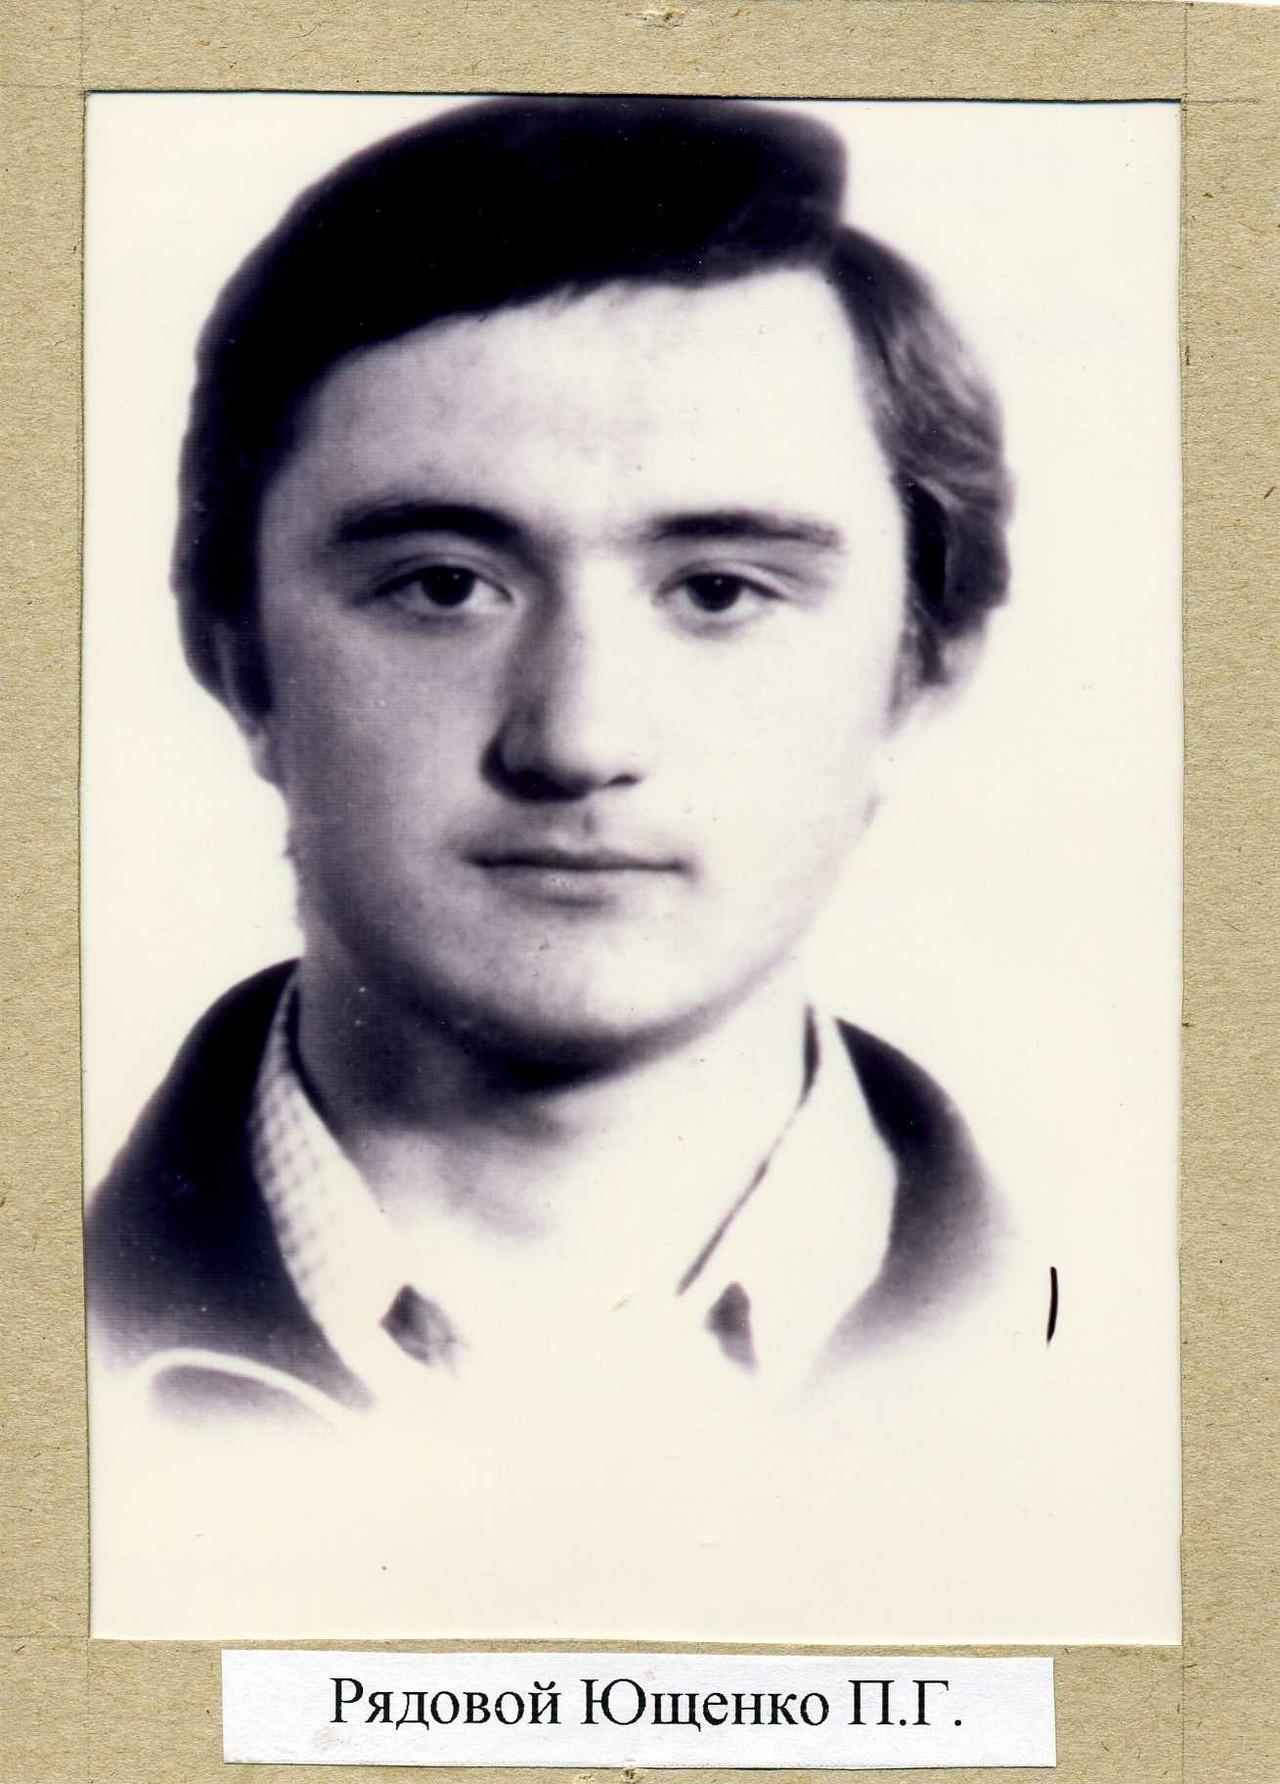 Ющенко Павел Гргорьевич